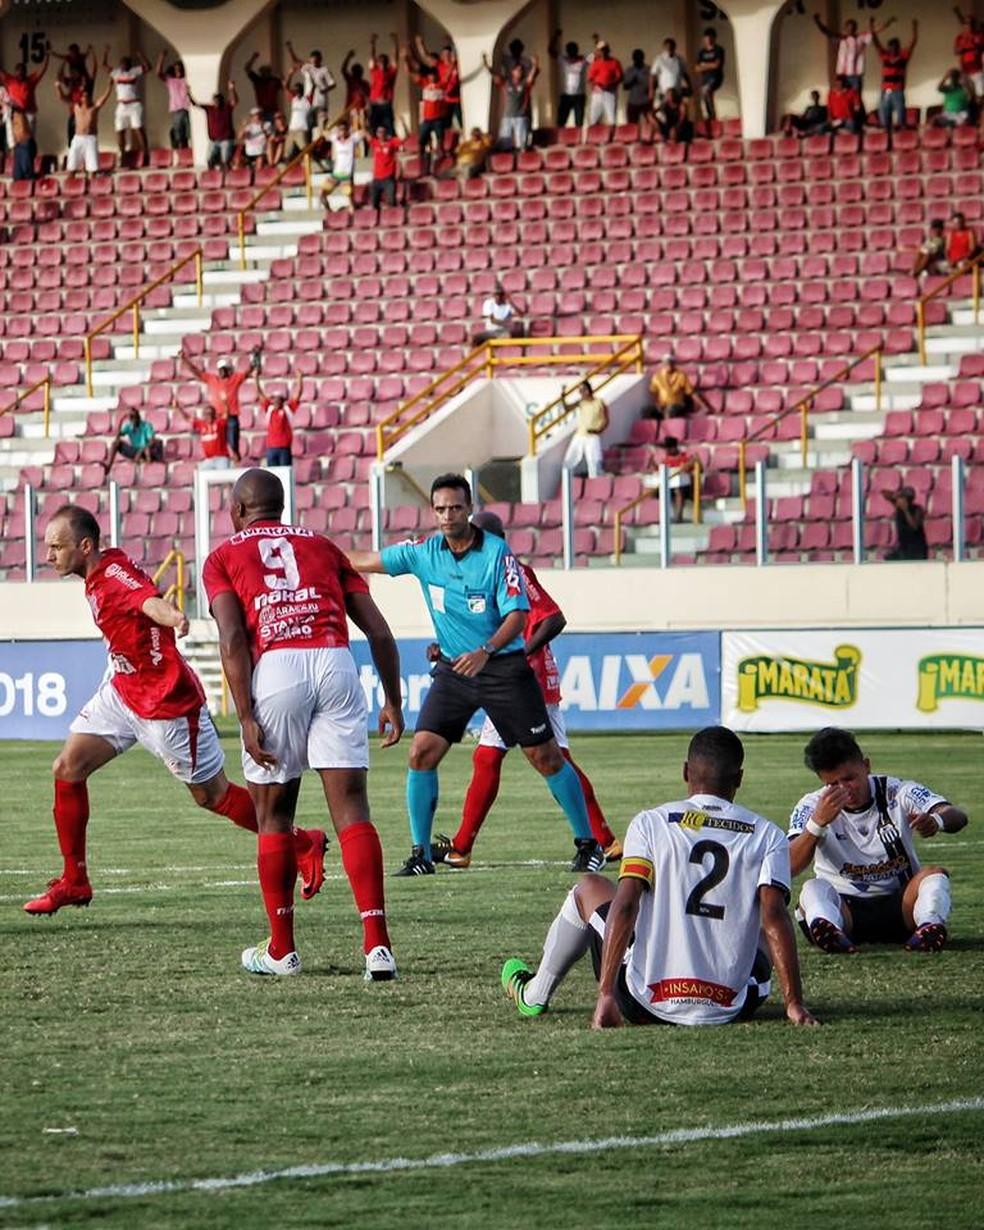 Danilo Rios marca o gol da vitória do Sergipe (Foto: Wendell Rezende)